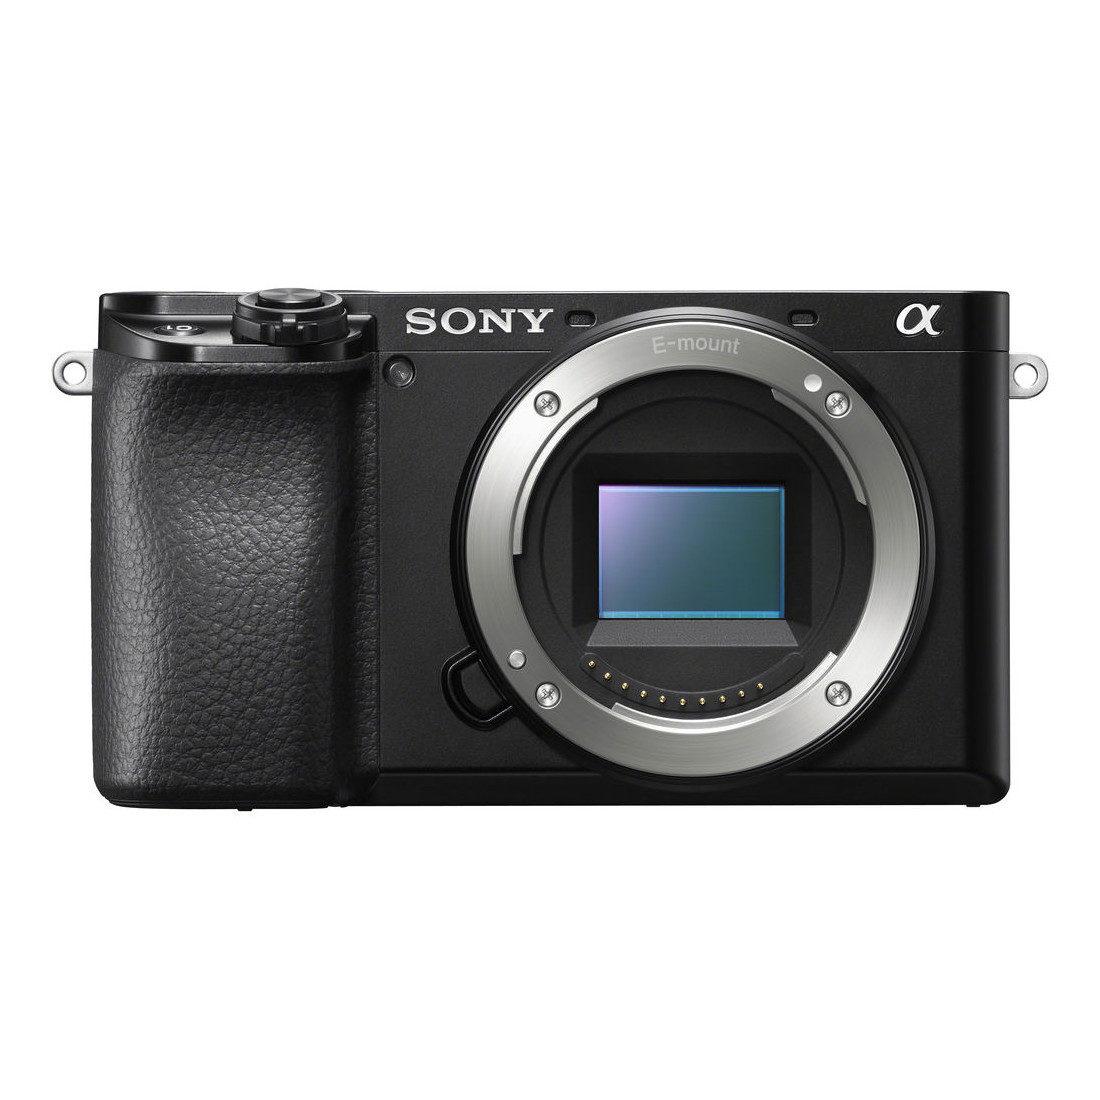 Sony Alpha A6100 systeemcamera Body Zwart (ILCE6100B.CEC) <br/>€ 749.00 <br/> <a href='https://www.cameranu.nl/fotografie/?tt=12190_474631_241358_&r=https%3A%2F%2Fwww.cameranu.nl%2Fnl%2Fp3071782%2Fsony-alpha-a6100-systeemcamera-body-zwart-ilce6100b-cec%3Fchannable%3De10841.MzA3MTc4Mg%26utm_campaign%3D%26utm_content%3DSony%2Bsysteemcamera%26utm_source%3DTradetracker%26utm_medium%3Dcpc%26utm_term%3DDigitale%2Bcamera%26apos%3Bs' target='_blank'>naar de winkel</a>